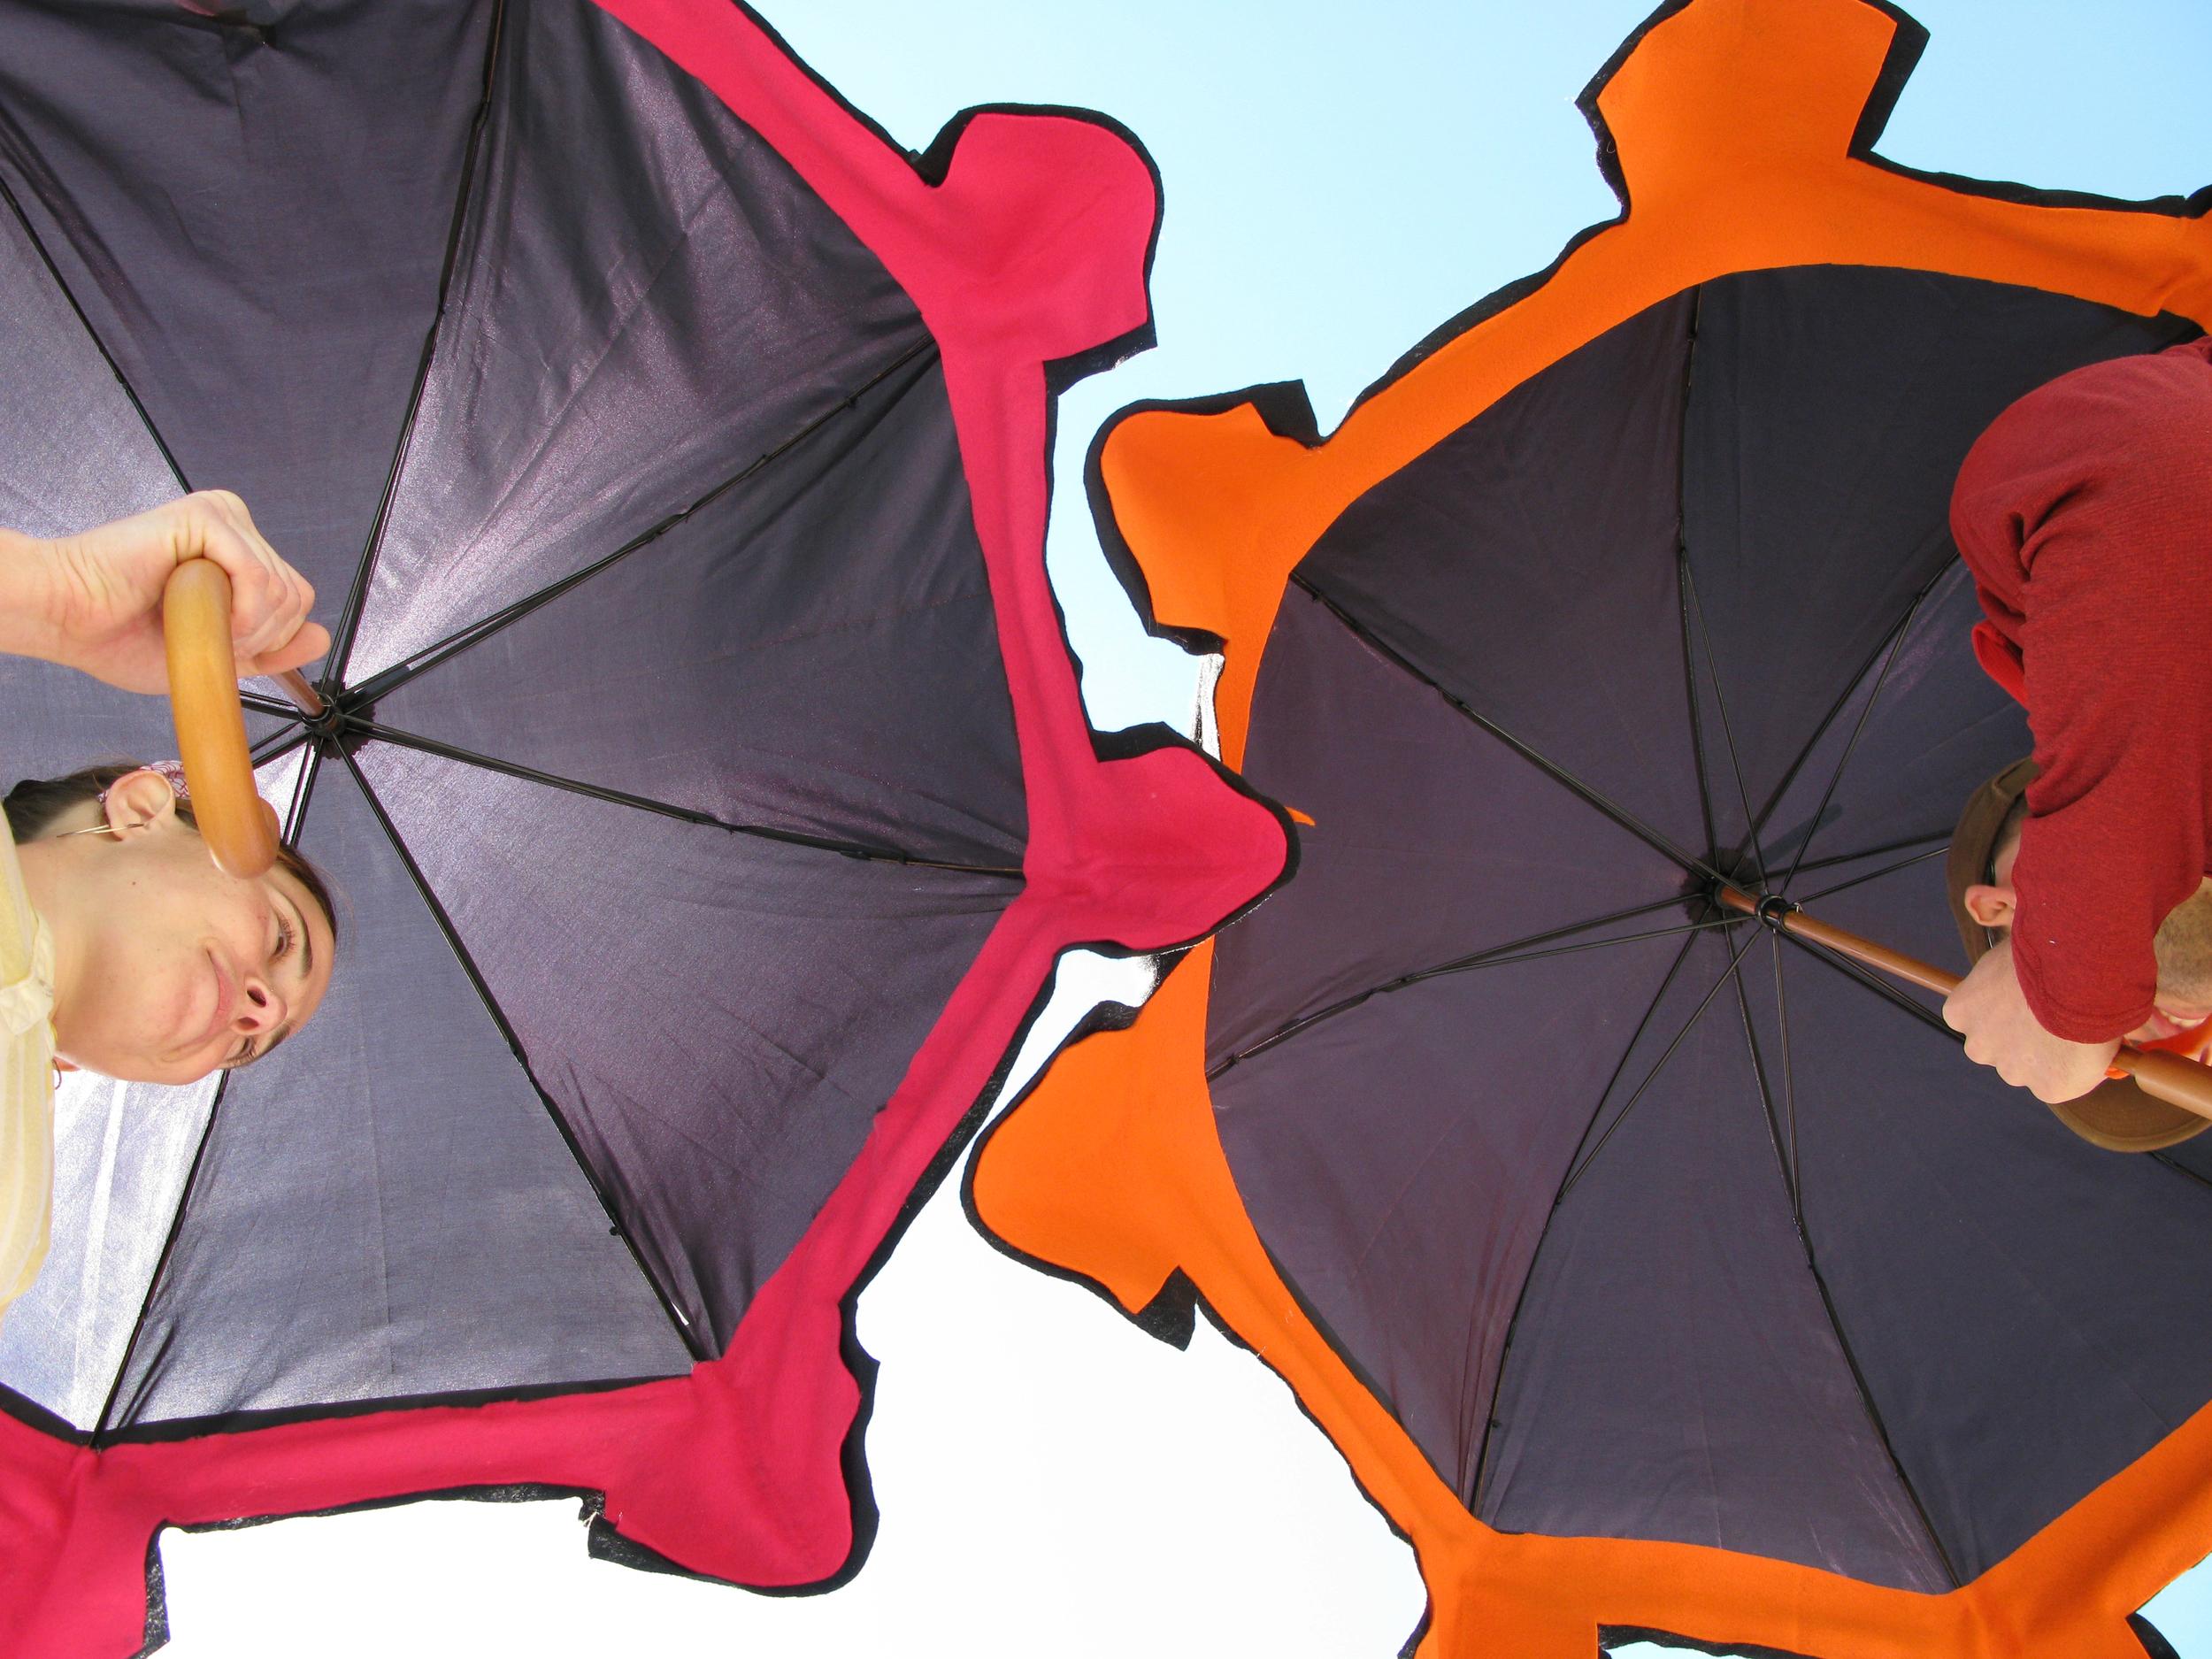 gear umbrella yrbk.jpg